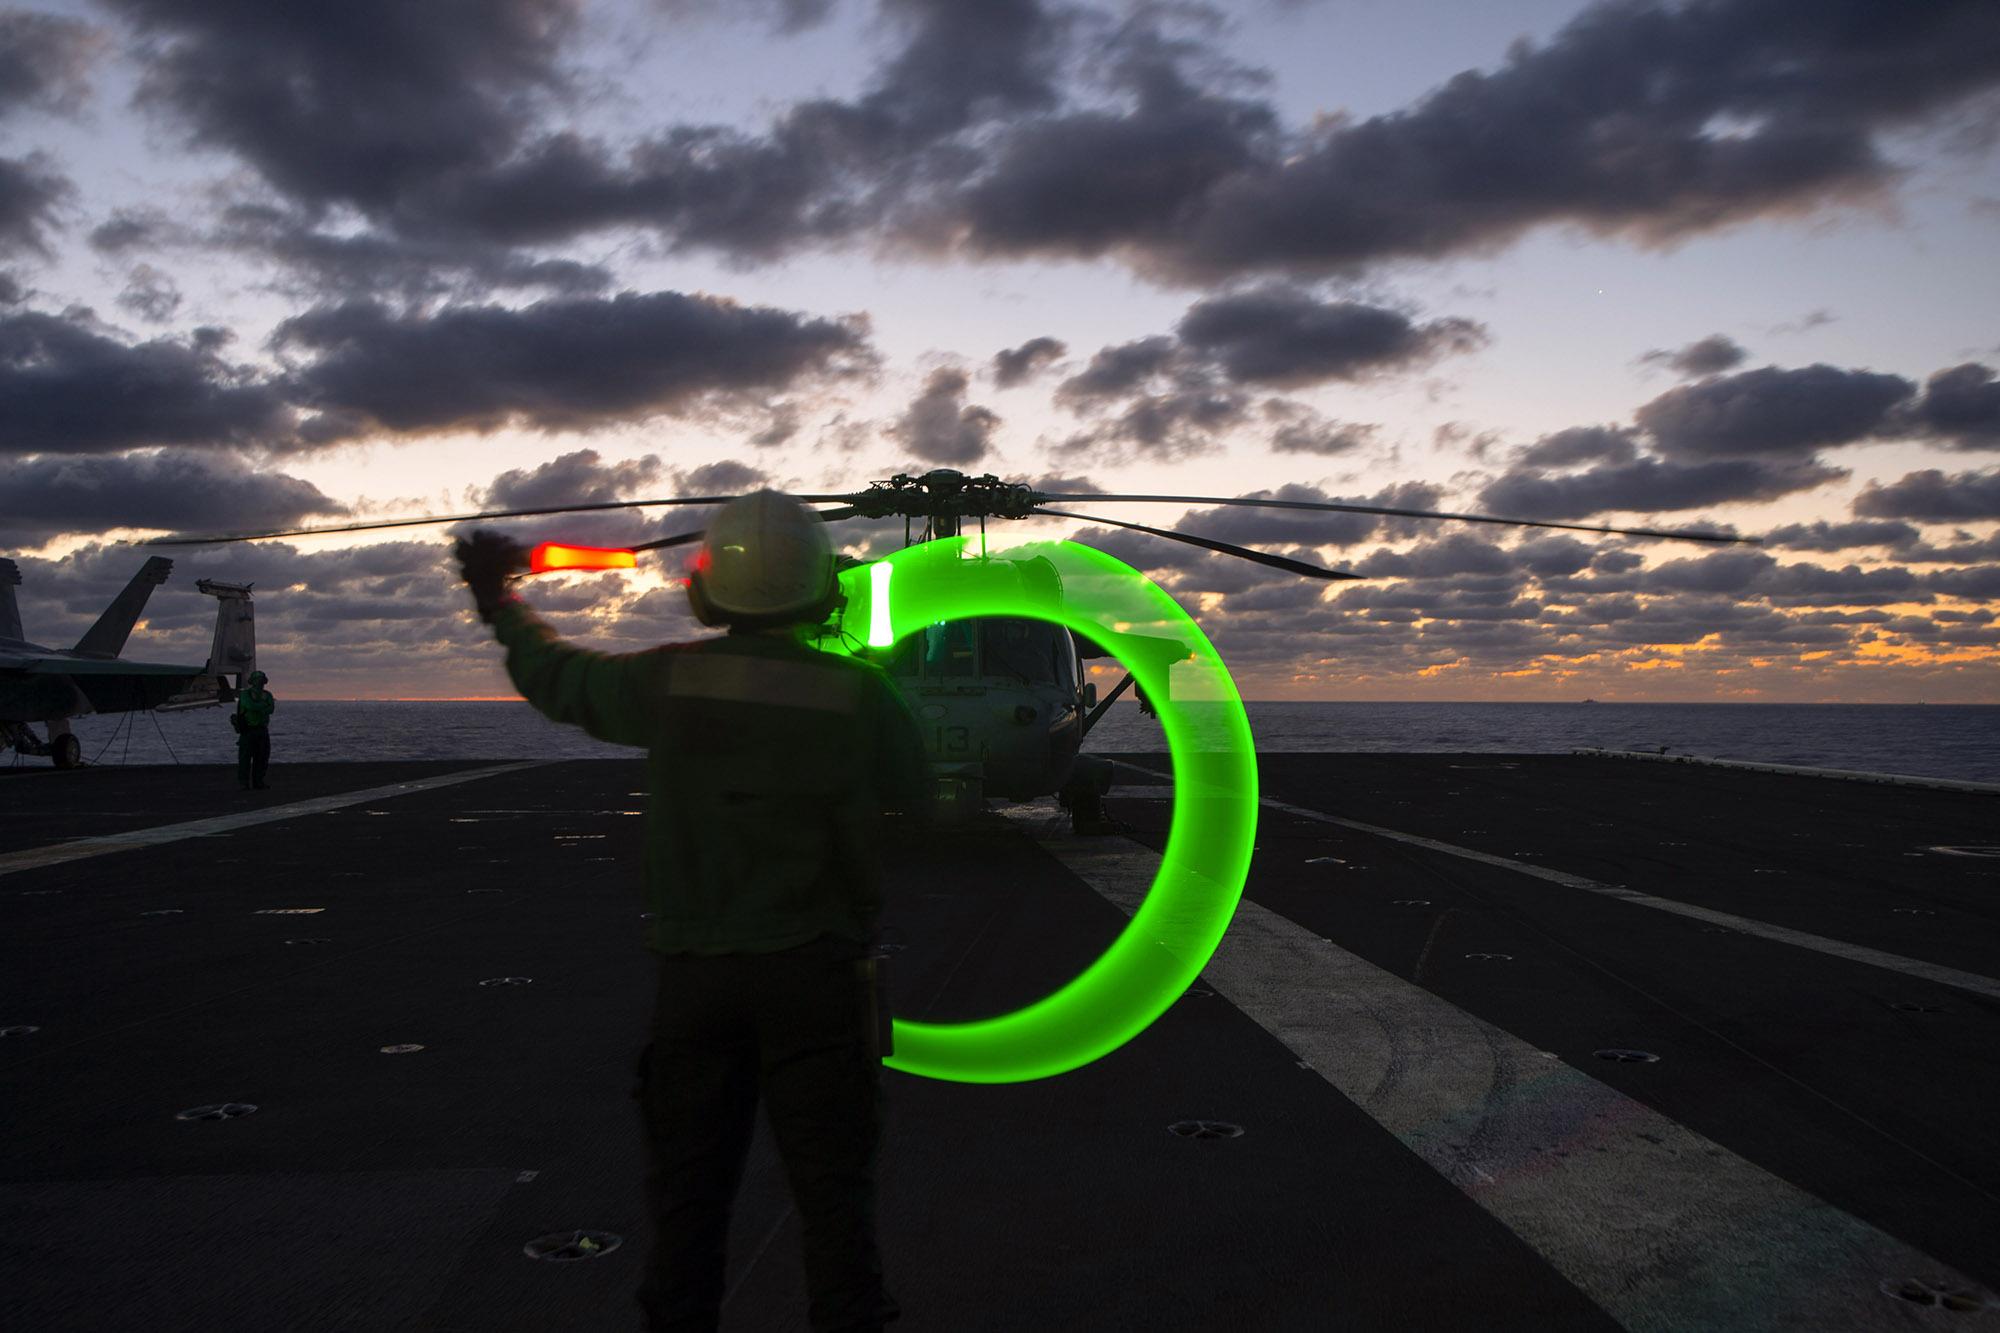 Aviation Structural Mechanic Airman Monica Smith directs a test of an alert helicopter on the flight deck aboard the Nimitz-class aircraft carrier USS Dwight D. Eisenhower (CVN 69), in the Mediterranean Sea, March 19, 2021. (Mass Communication Specialist Seaman Trent P. Hawkins/Navy)